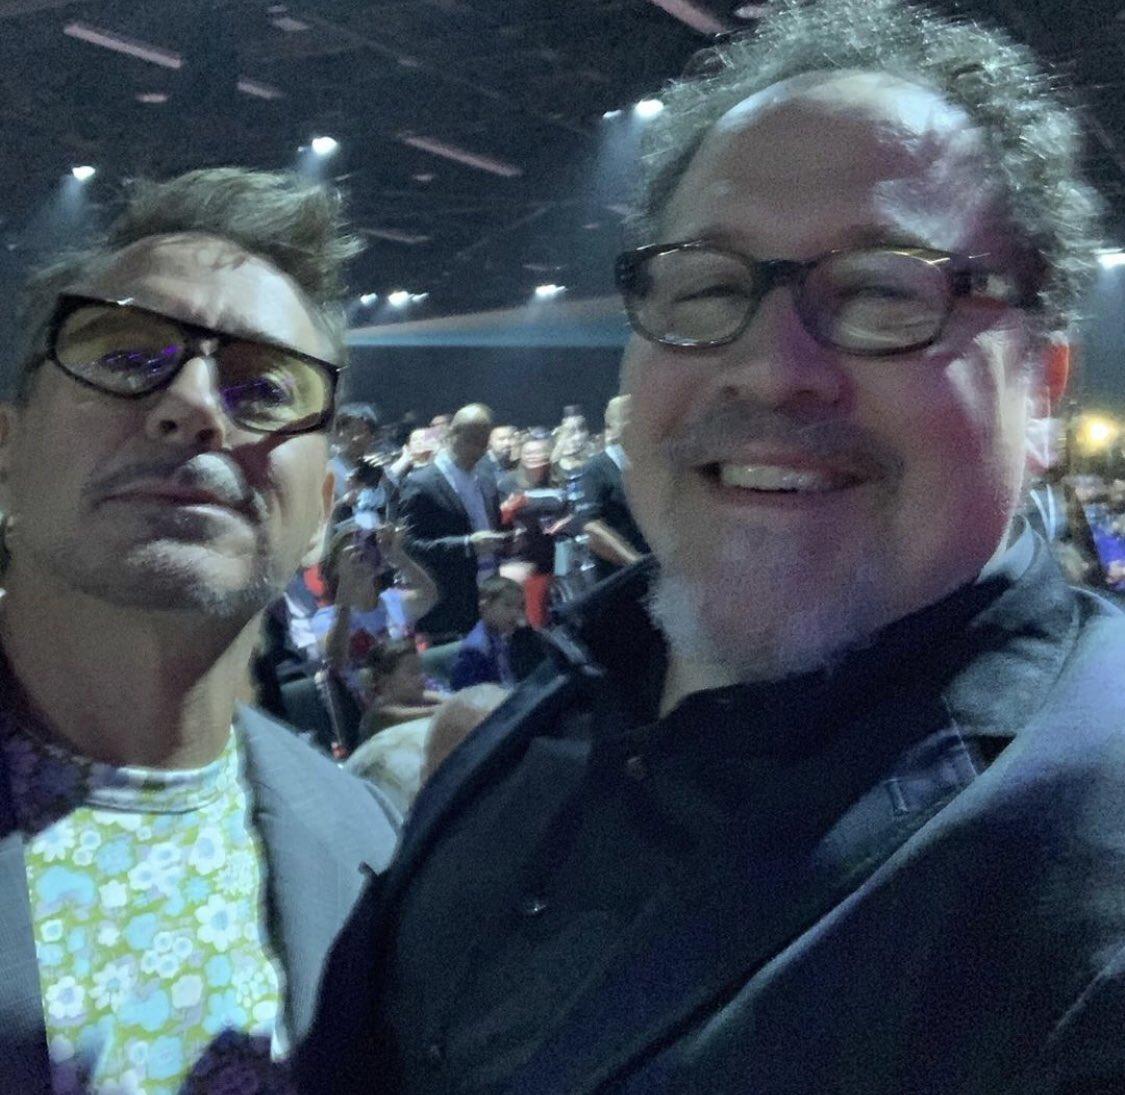 RT @77MCU: Robert Downey Jr and Jon Favreau #D23Expo https://t.co/j8iOtpV8bI